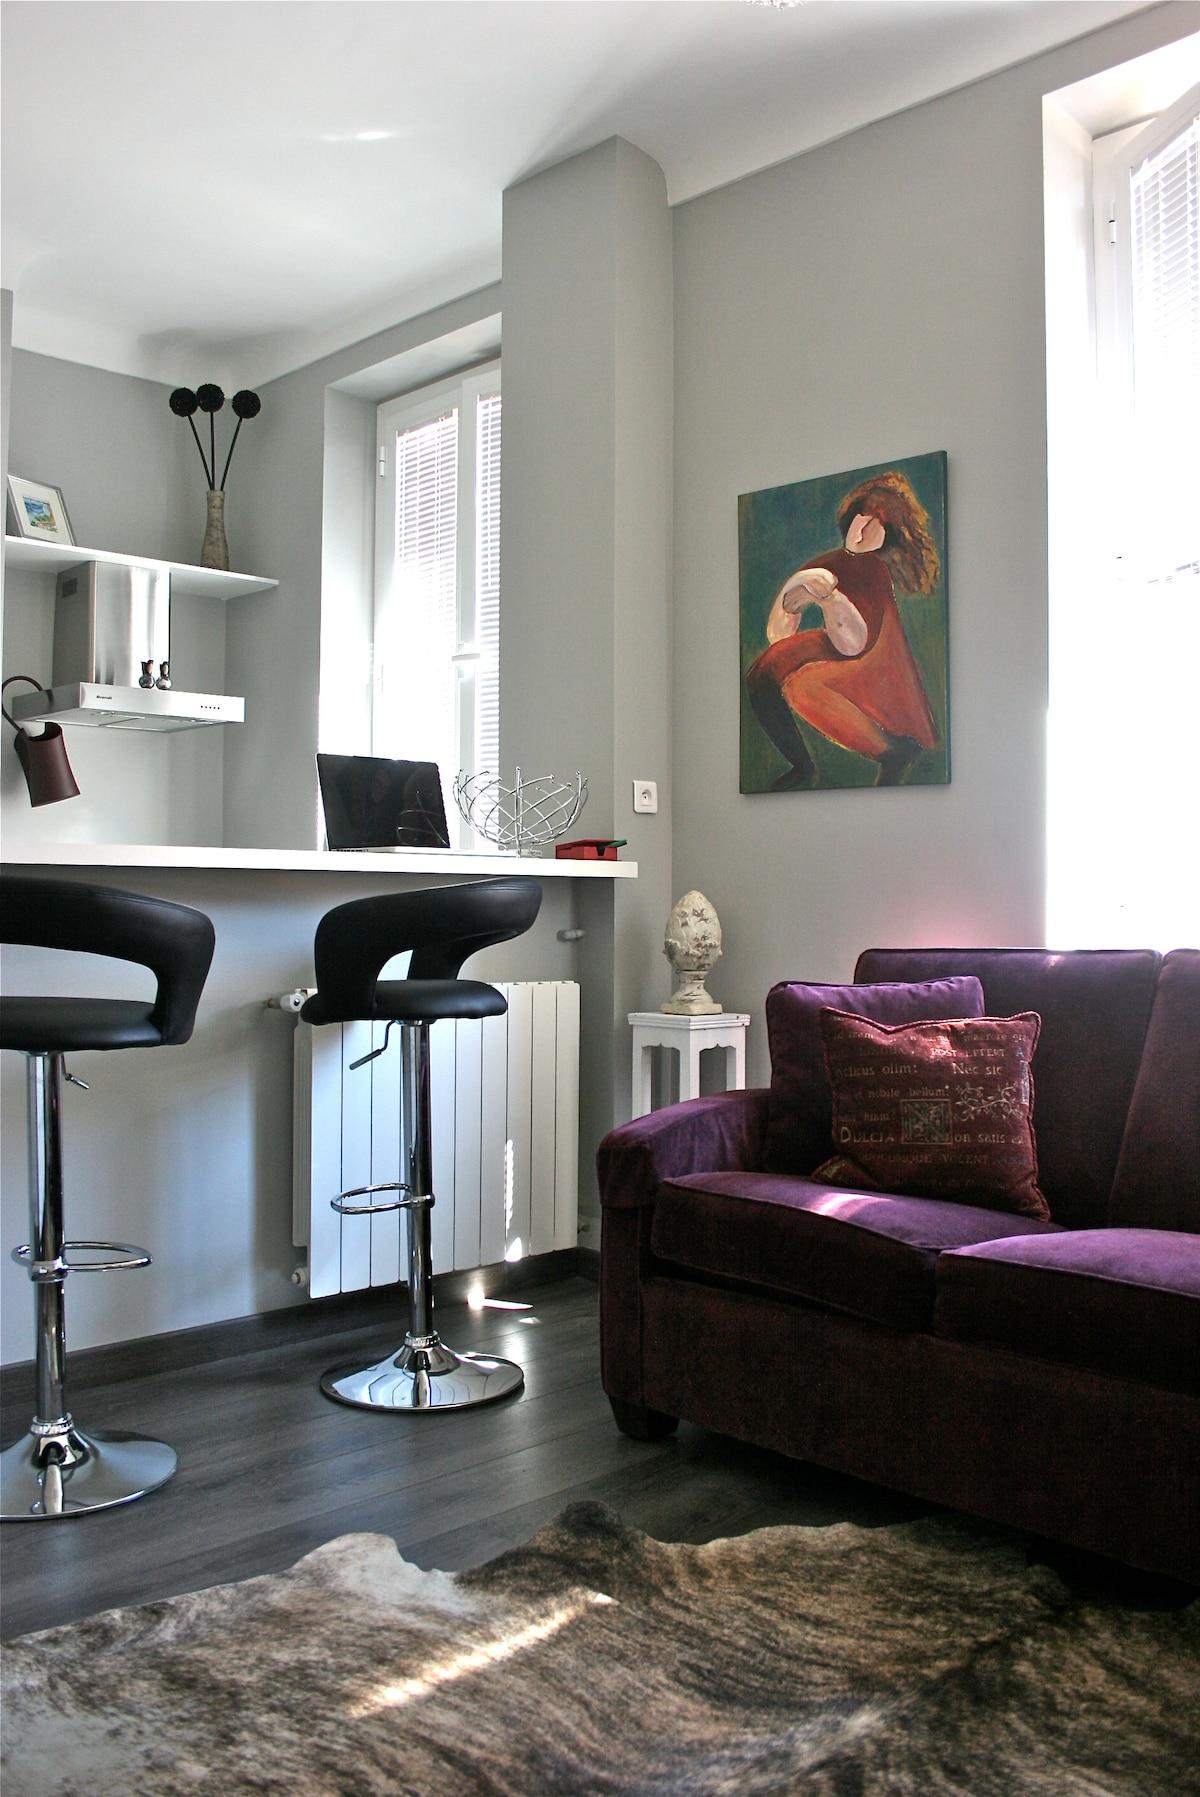 1 bed apartment in Beaulieu-sur-Mer